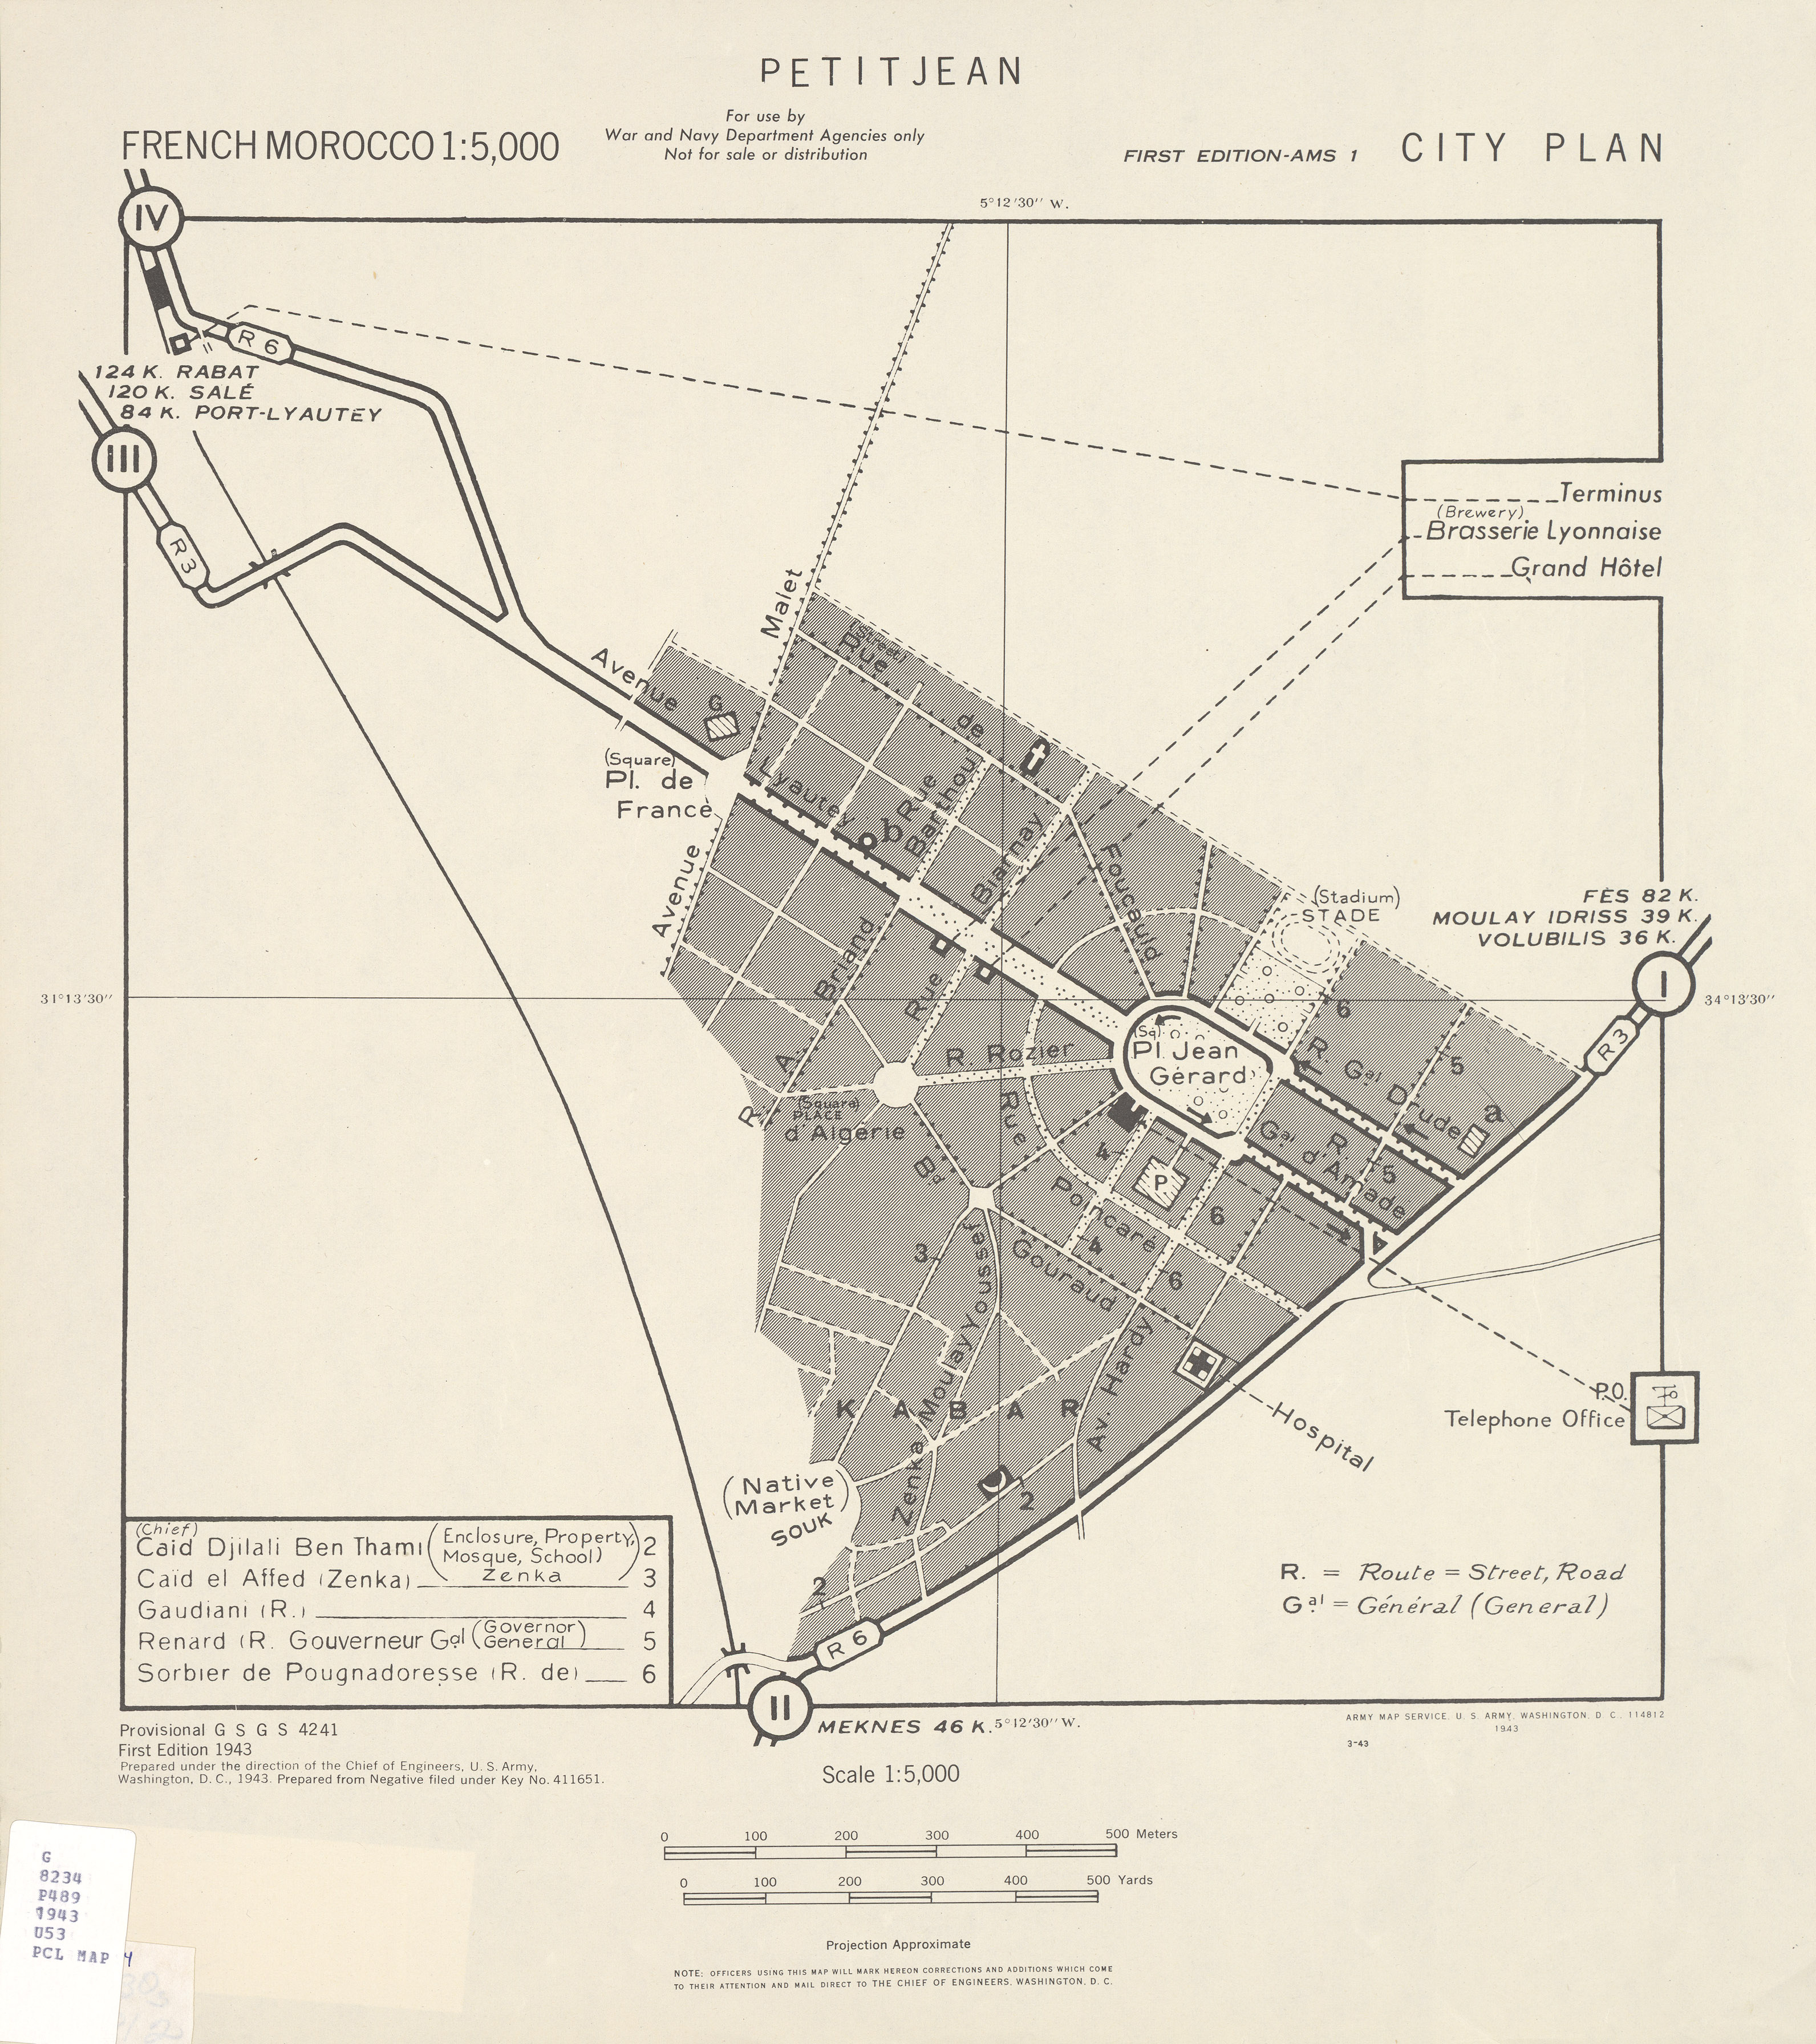 Mapa de la Ciudad de Sidi Kacem (Petitjean), Marruecos 1943